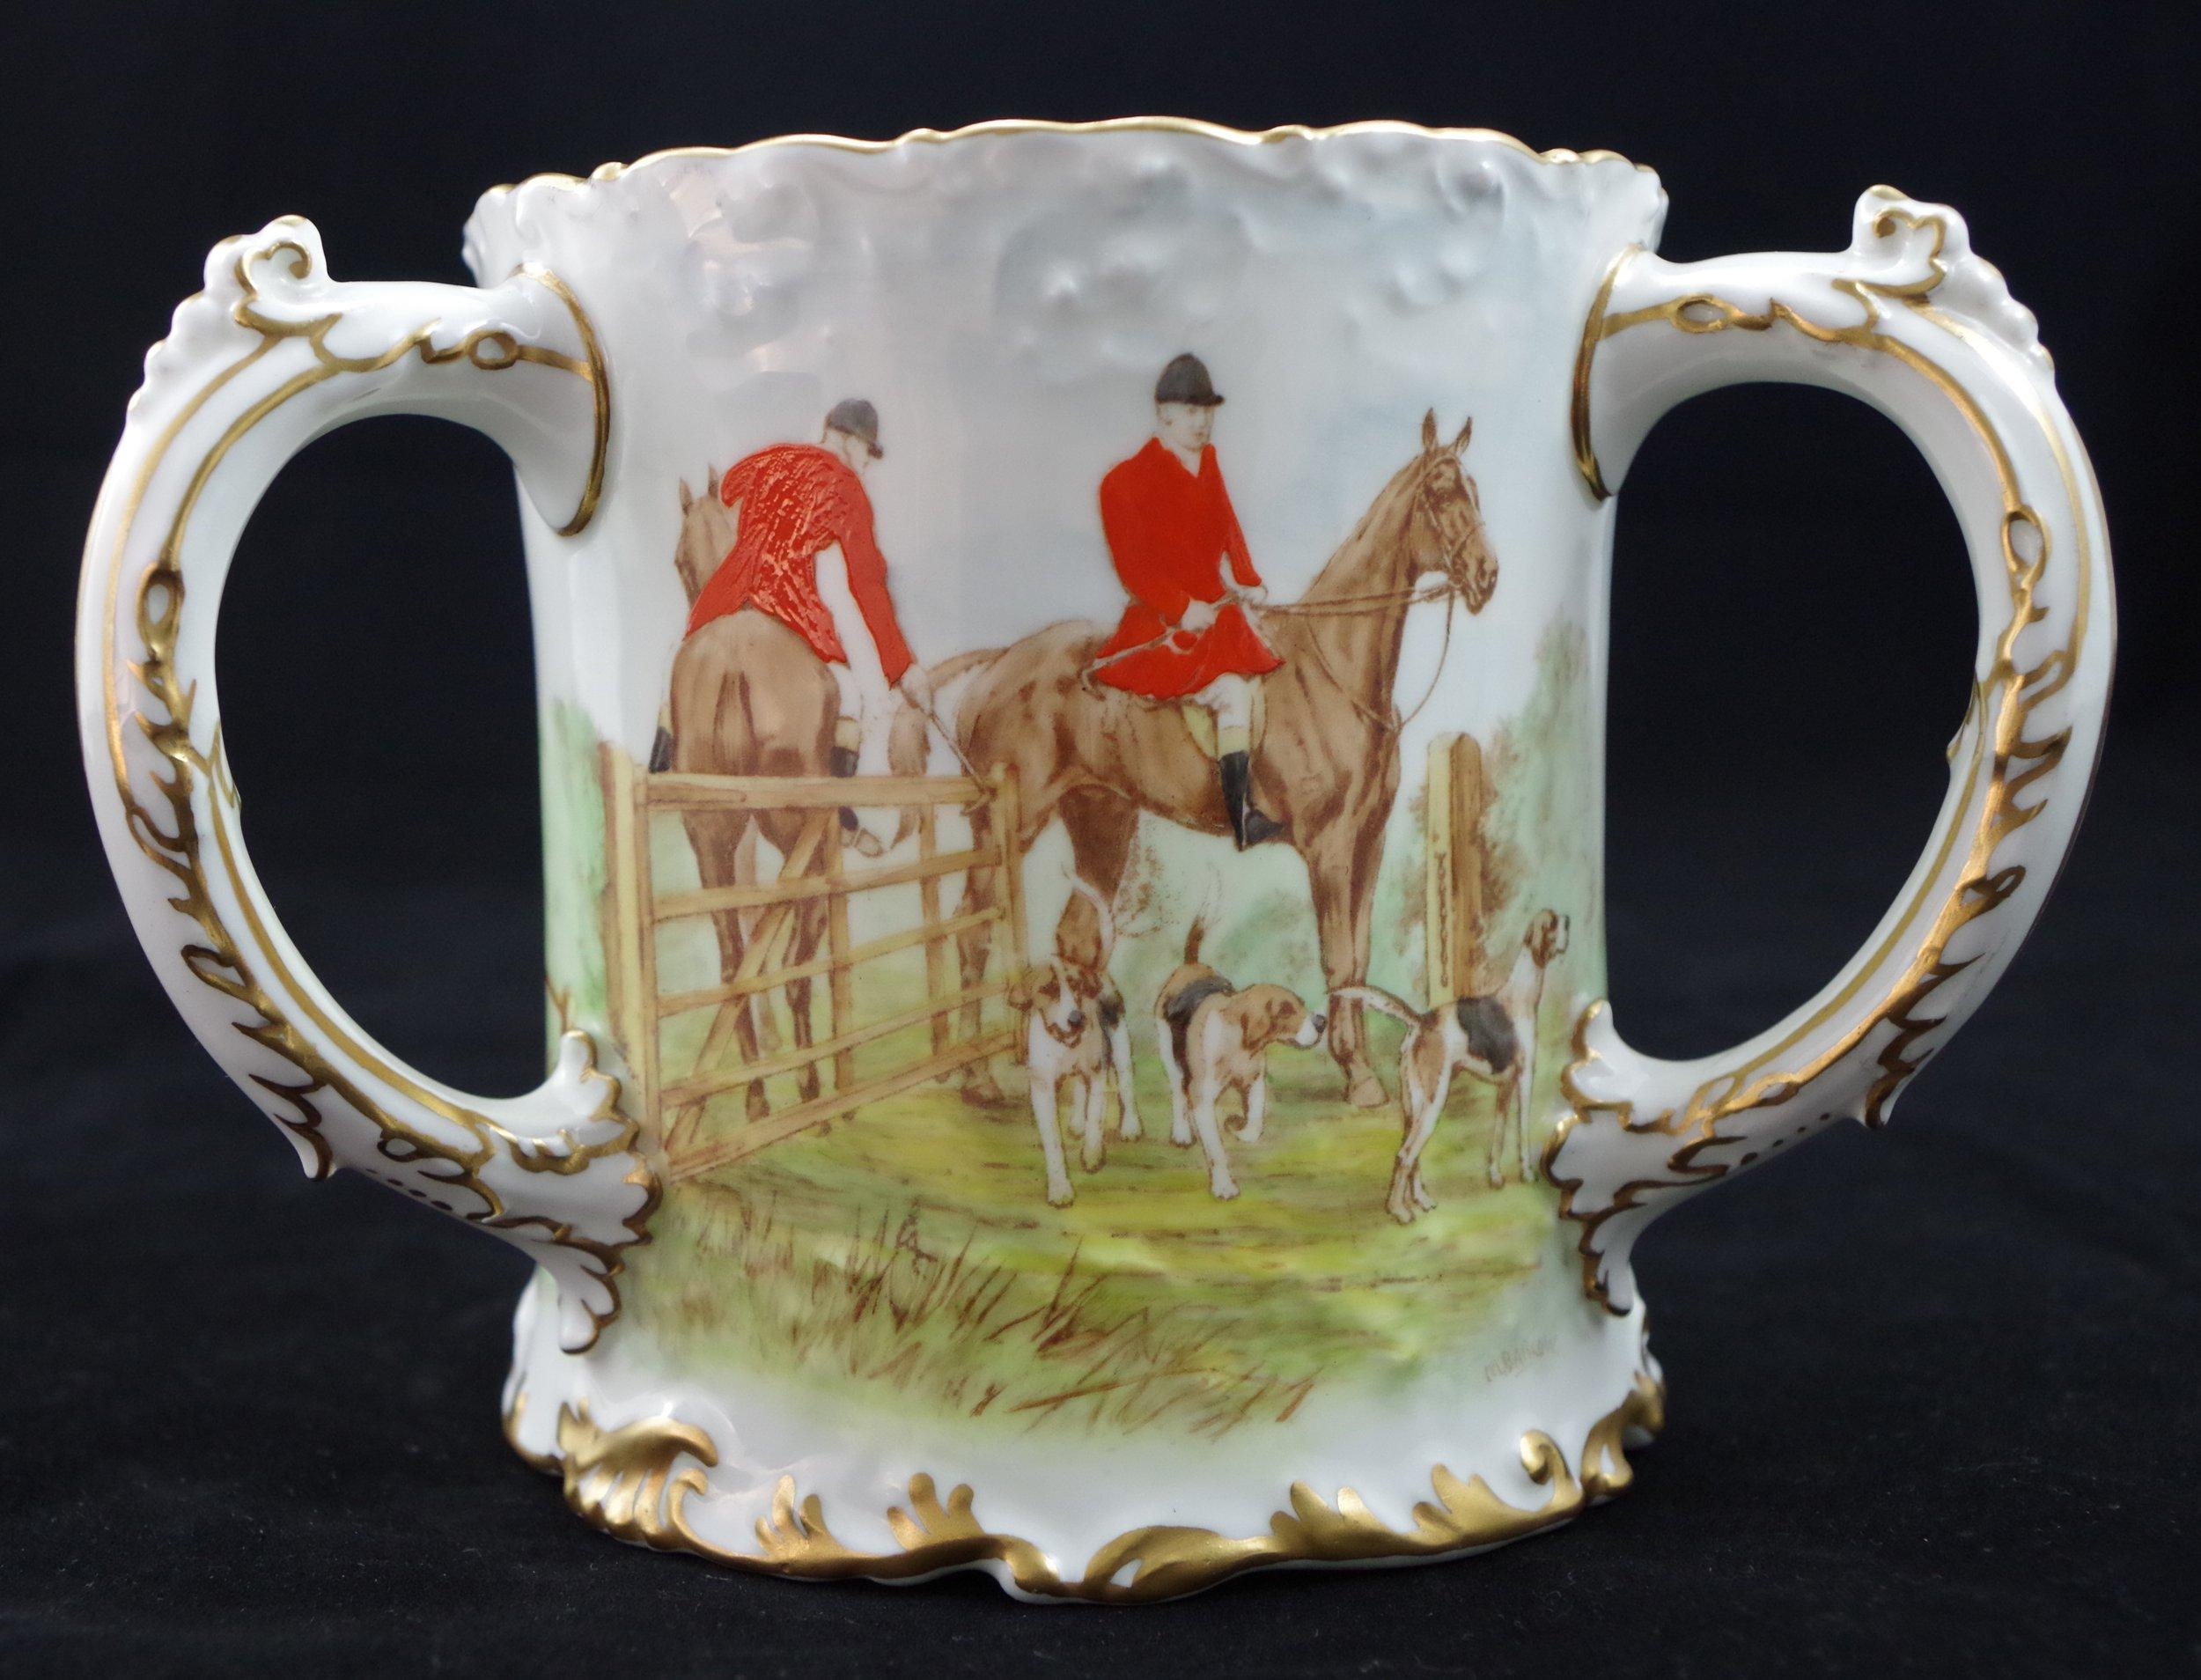 royal-crown-derby-tyg-rouen-shape-884-hunting-scene-barlow-side-2